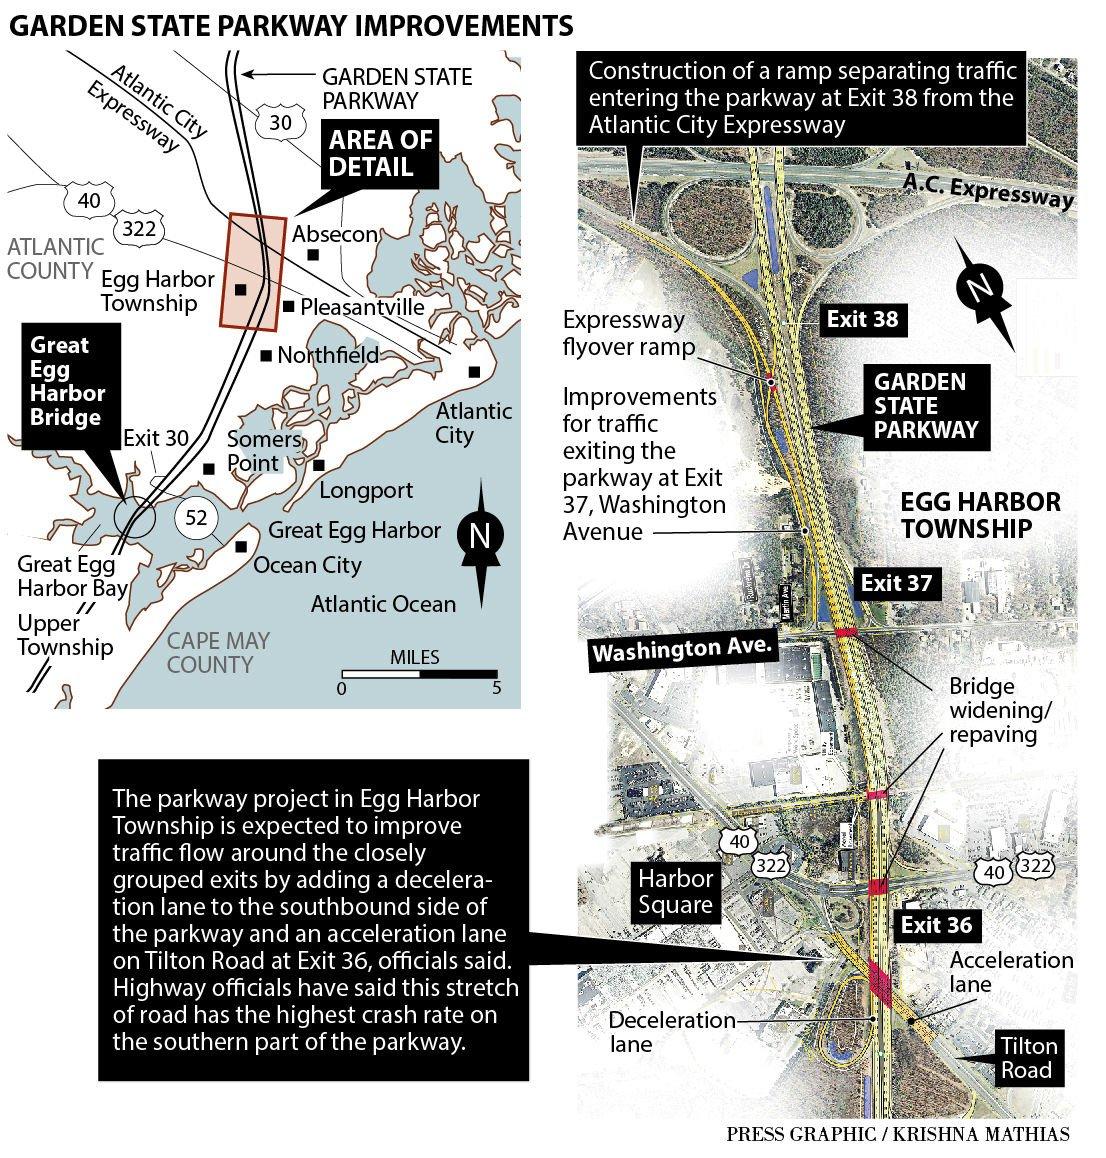 Garden State Parkway improvements 5-2016 map